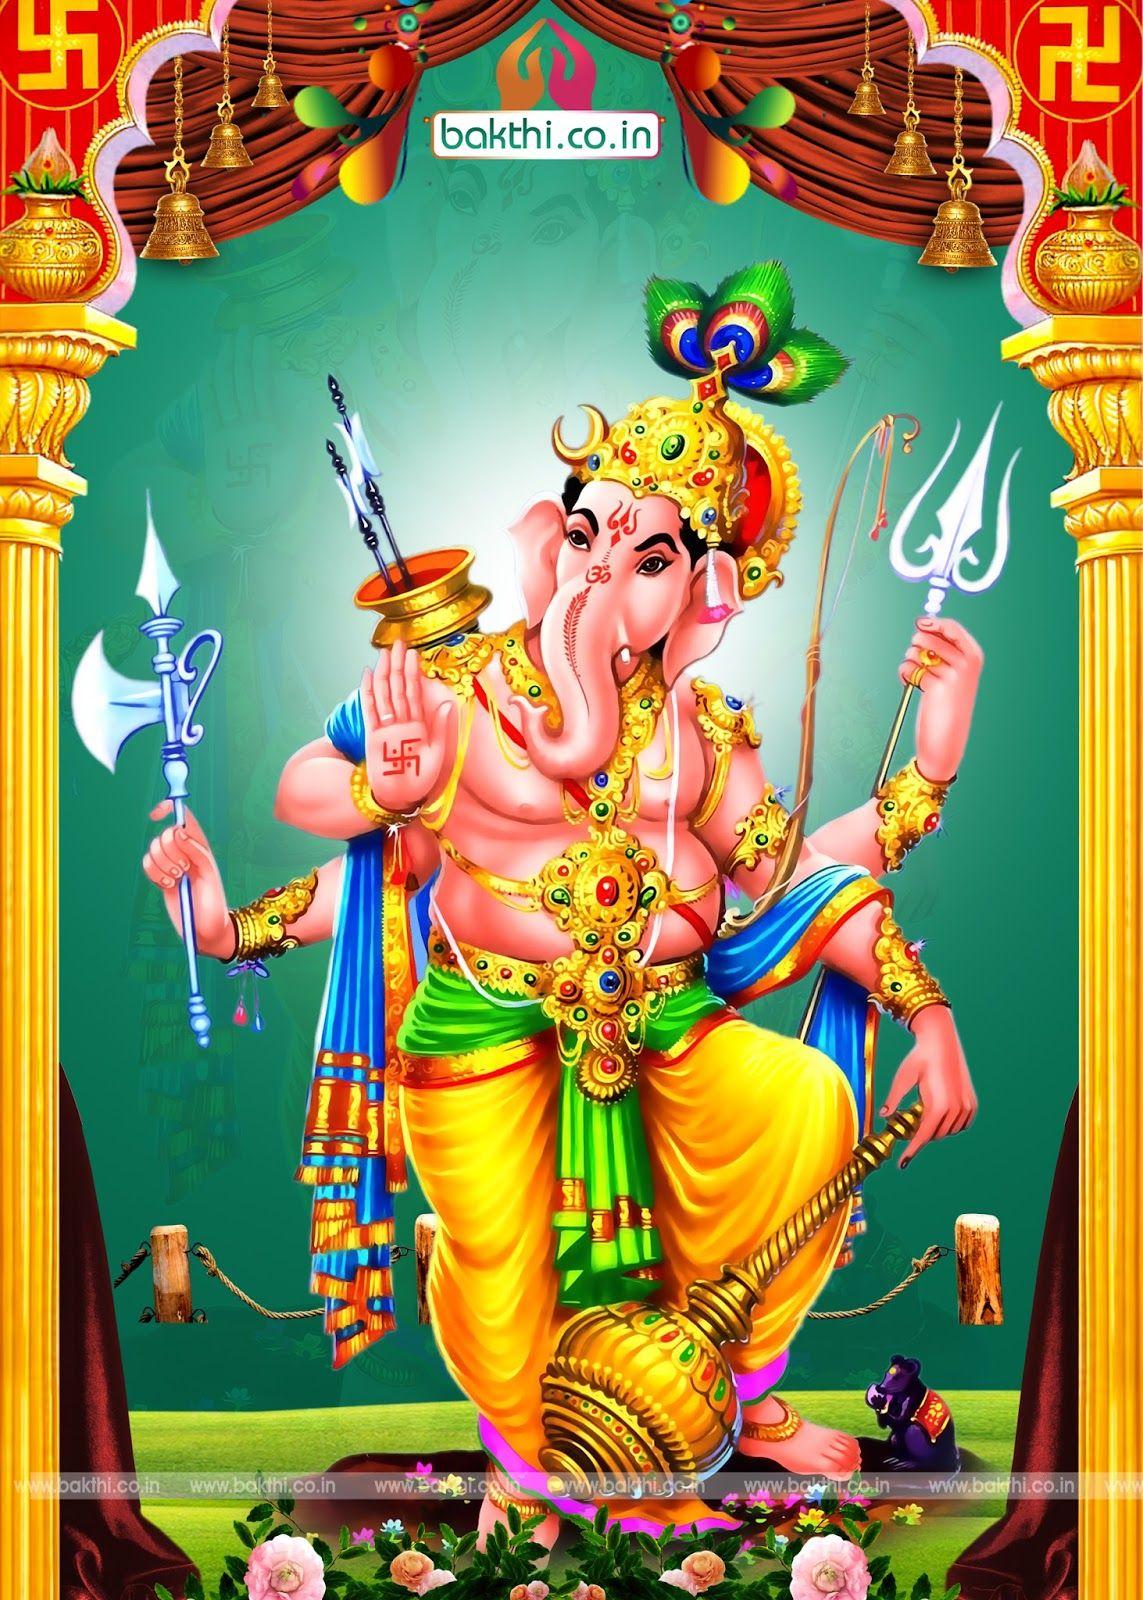 Hd wallpaper vinayagar - Lord Ganesha Hd Full Standing Photo Wallpaper Free Bakthi Co In Devoitonal